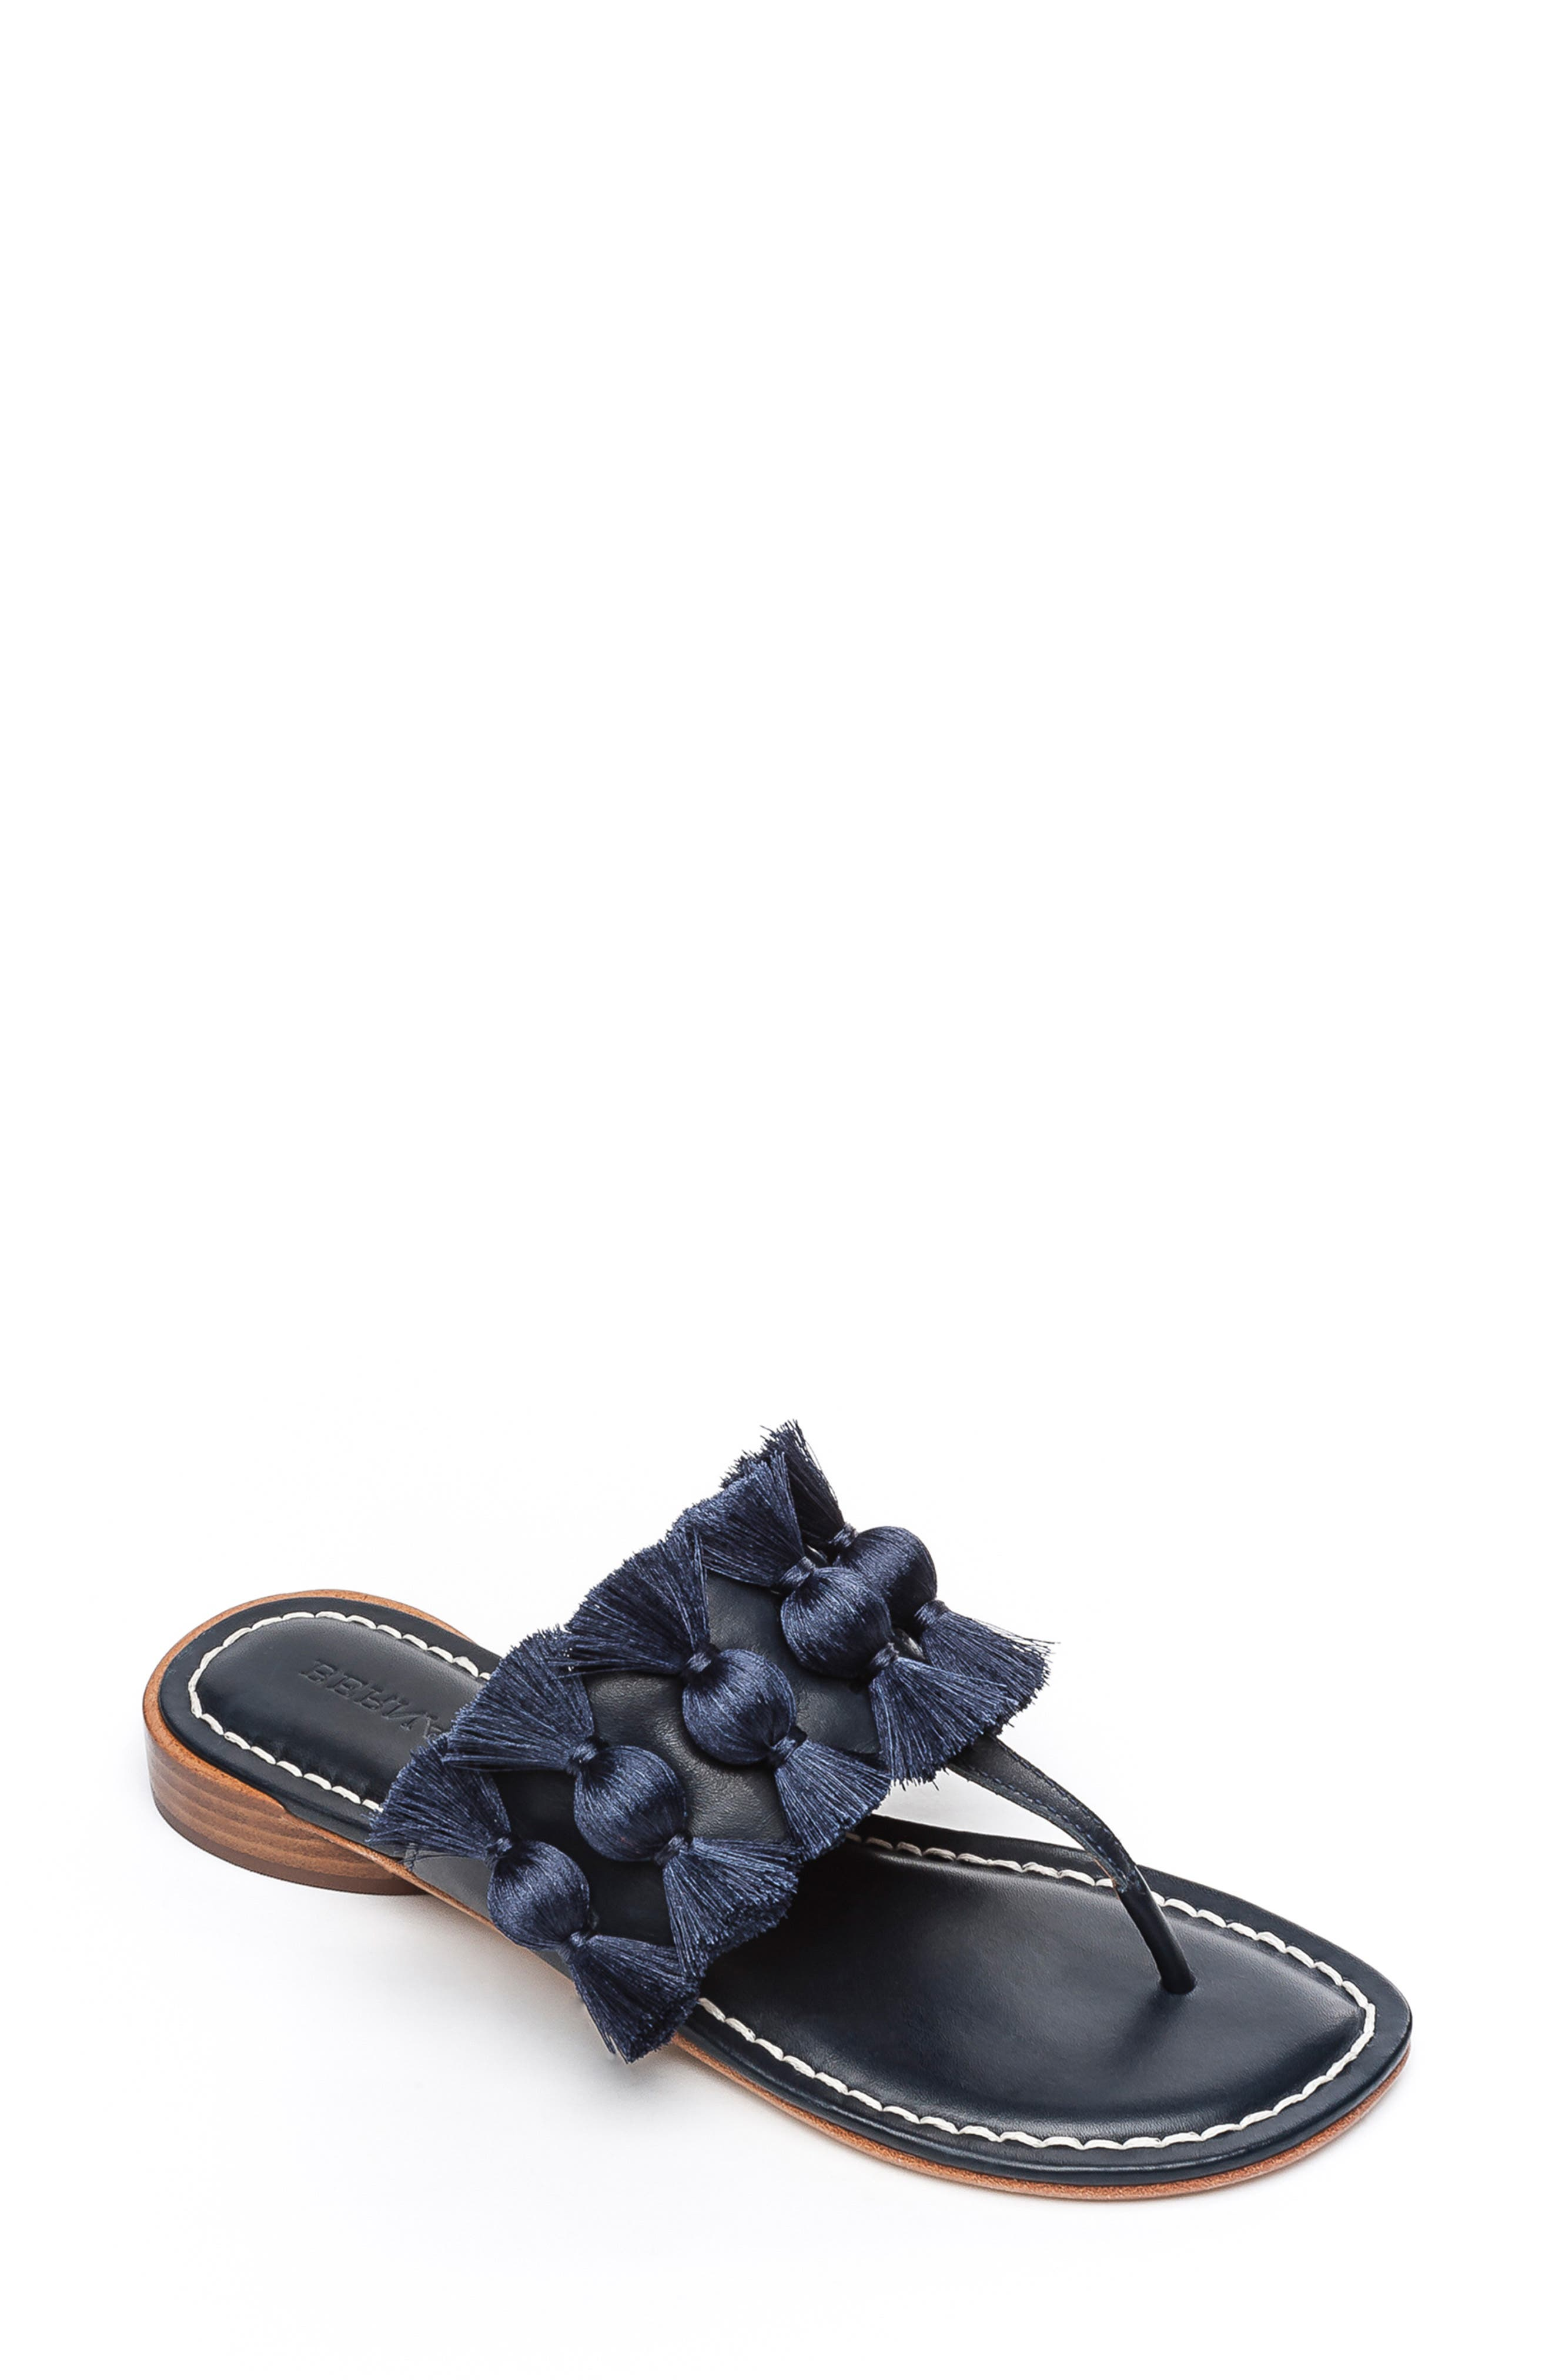 BERNARDO, Footwear Tara Flip Flop, Main thumbnail 1, color, NAVY ANTIQUE LEATHER